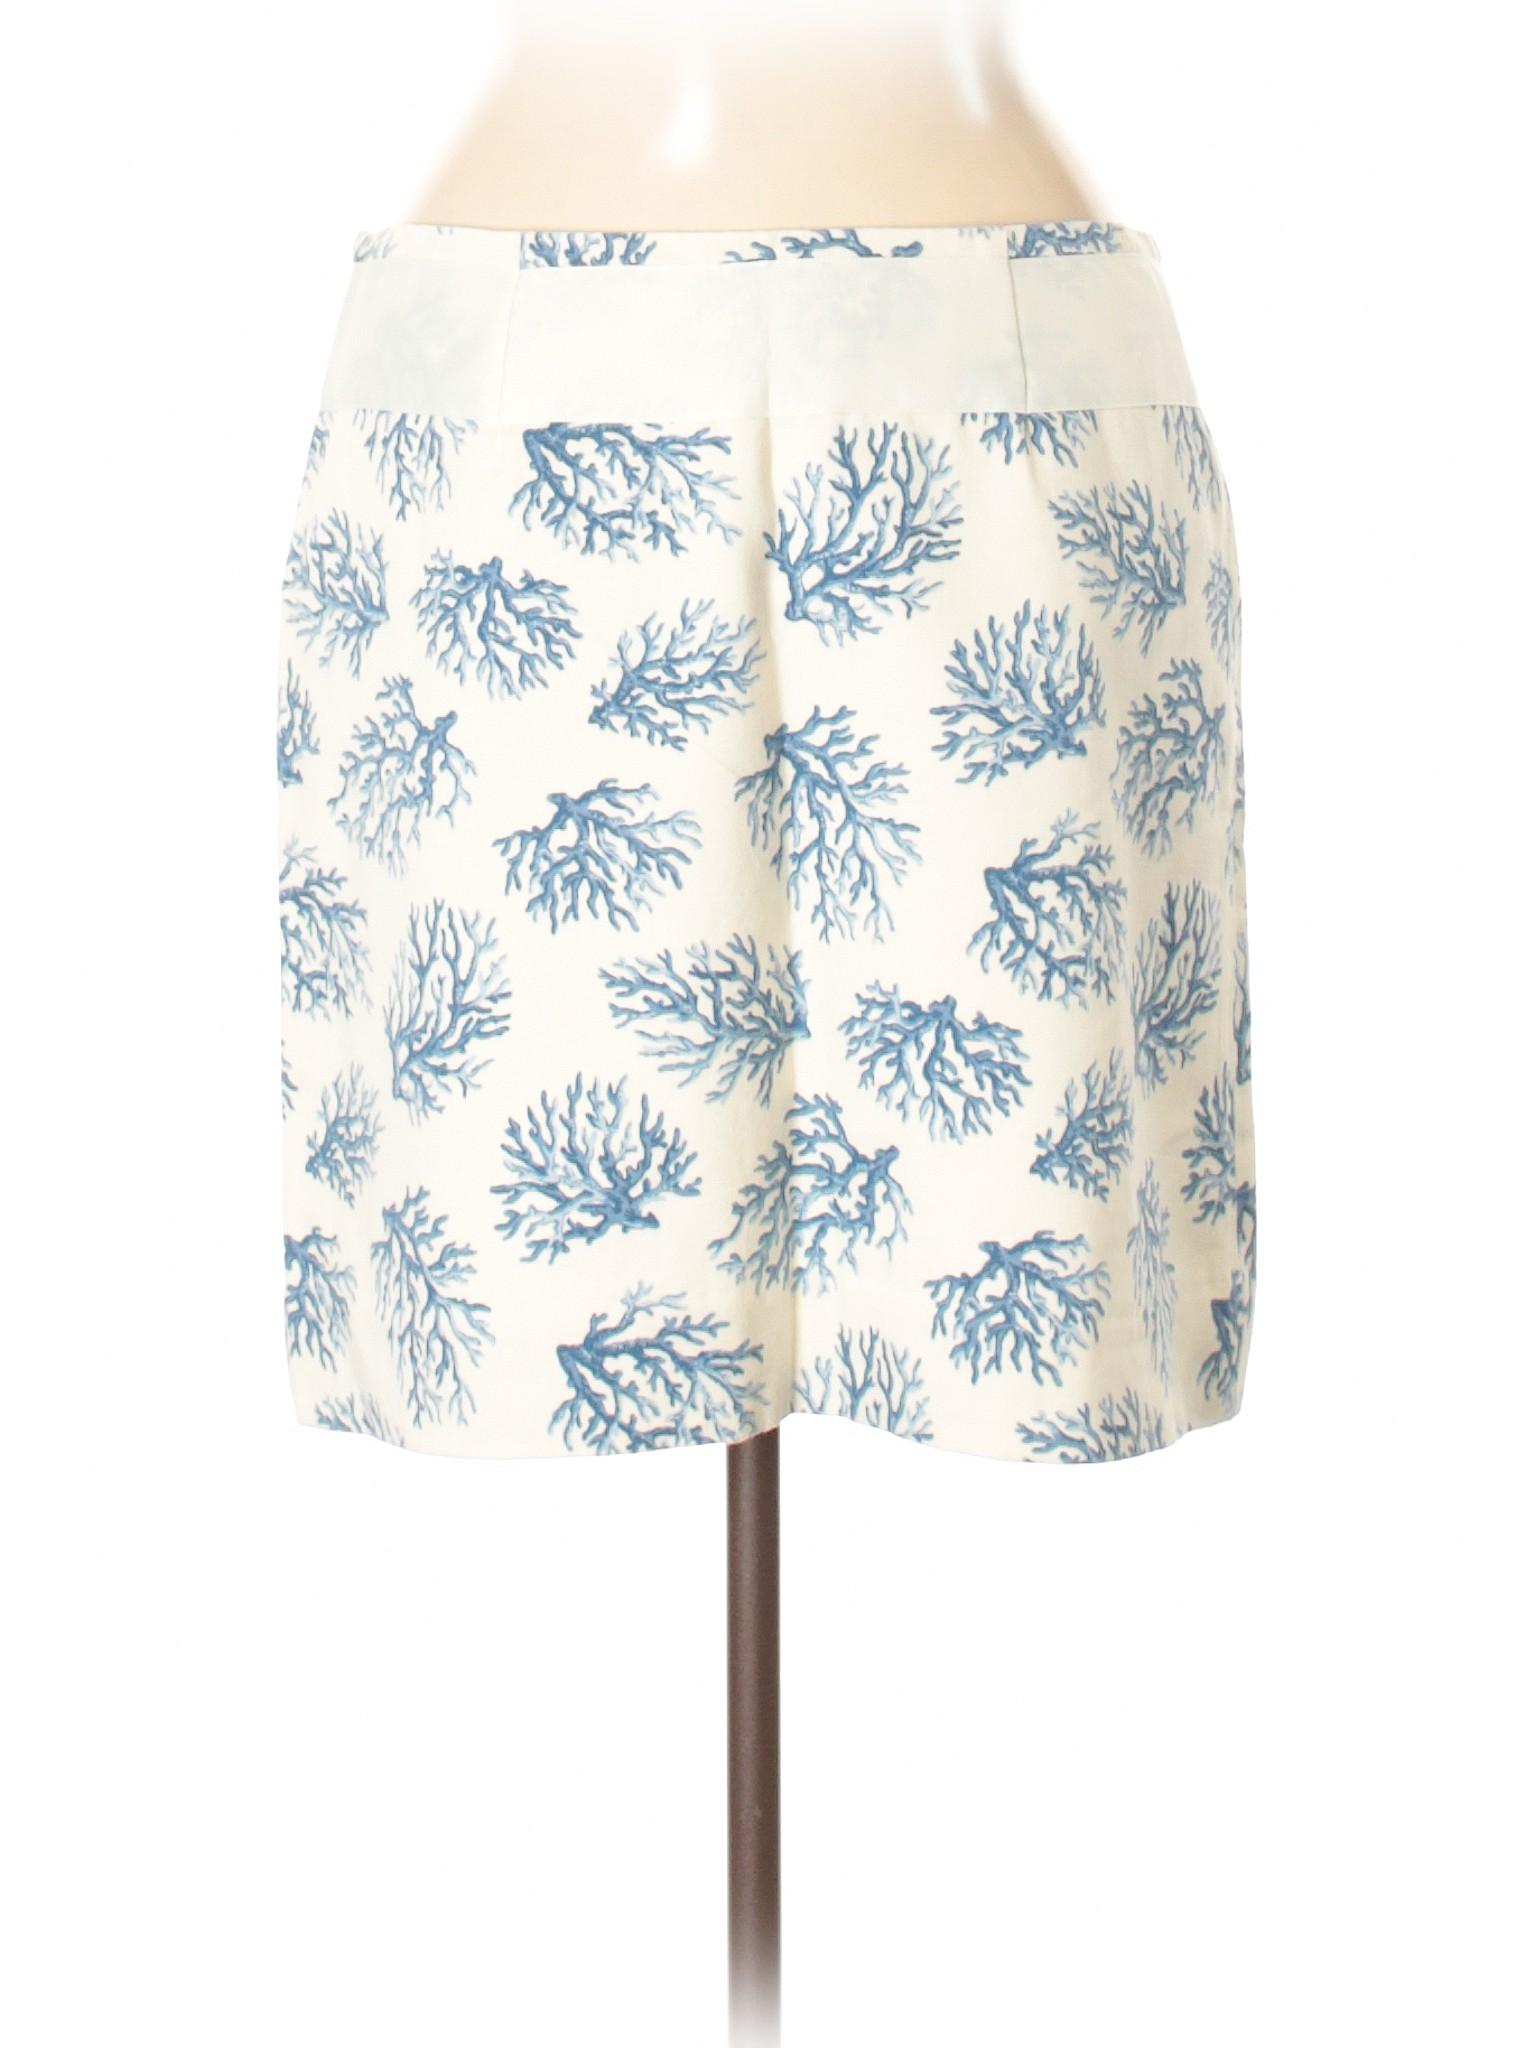 Boutique Skirt Boutique Casual Casual xP4qy7T1